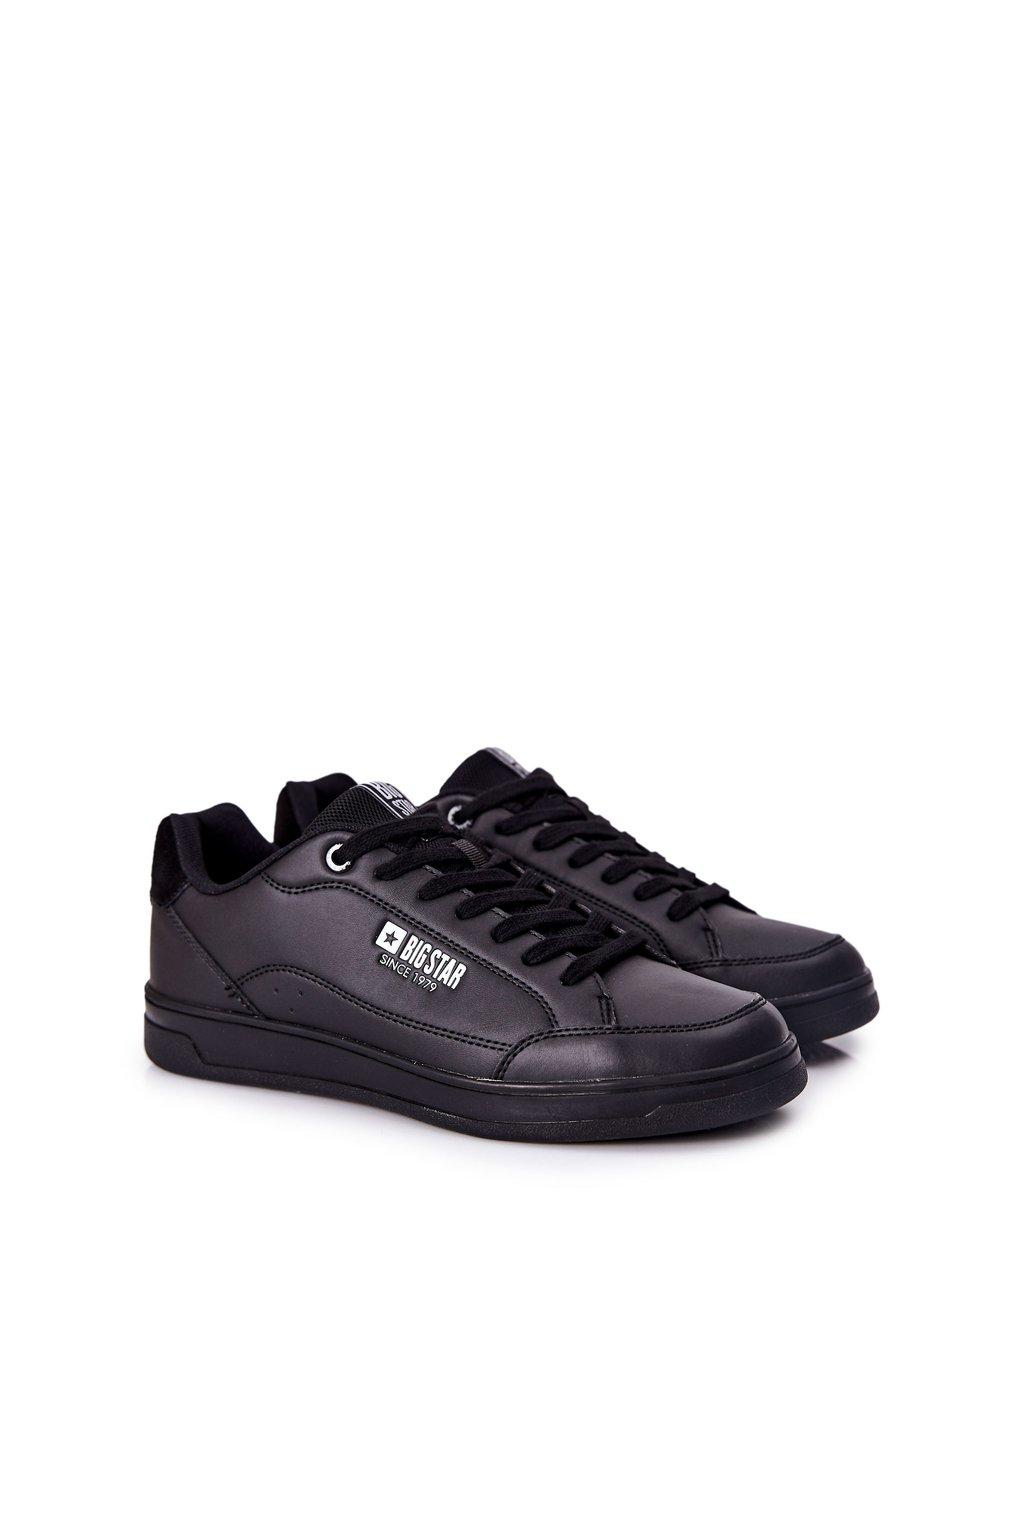 Čierna obuv kód topánok II174169 BLK